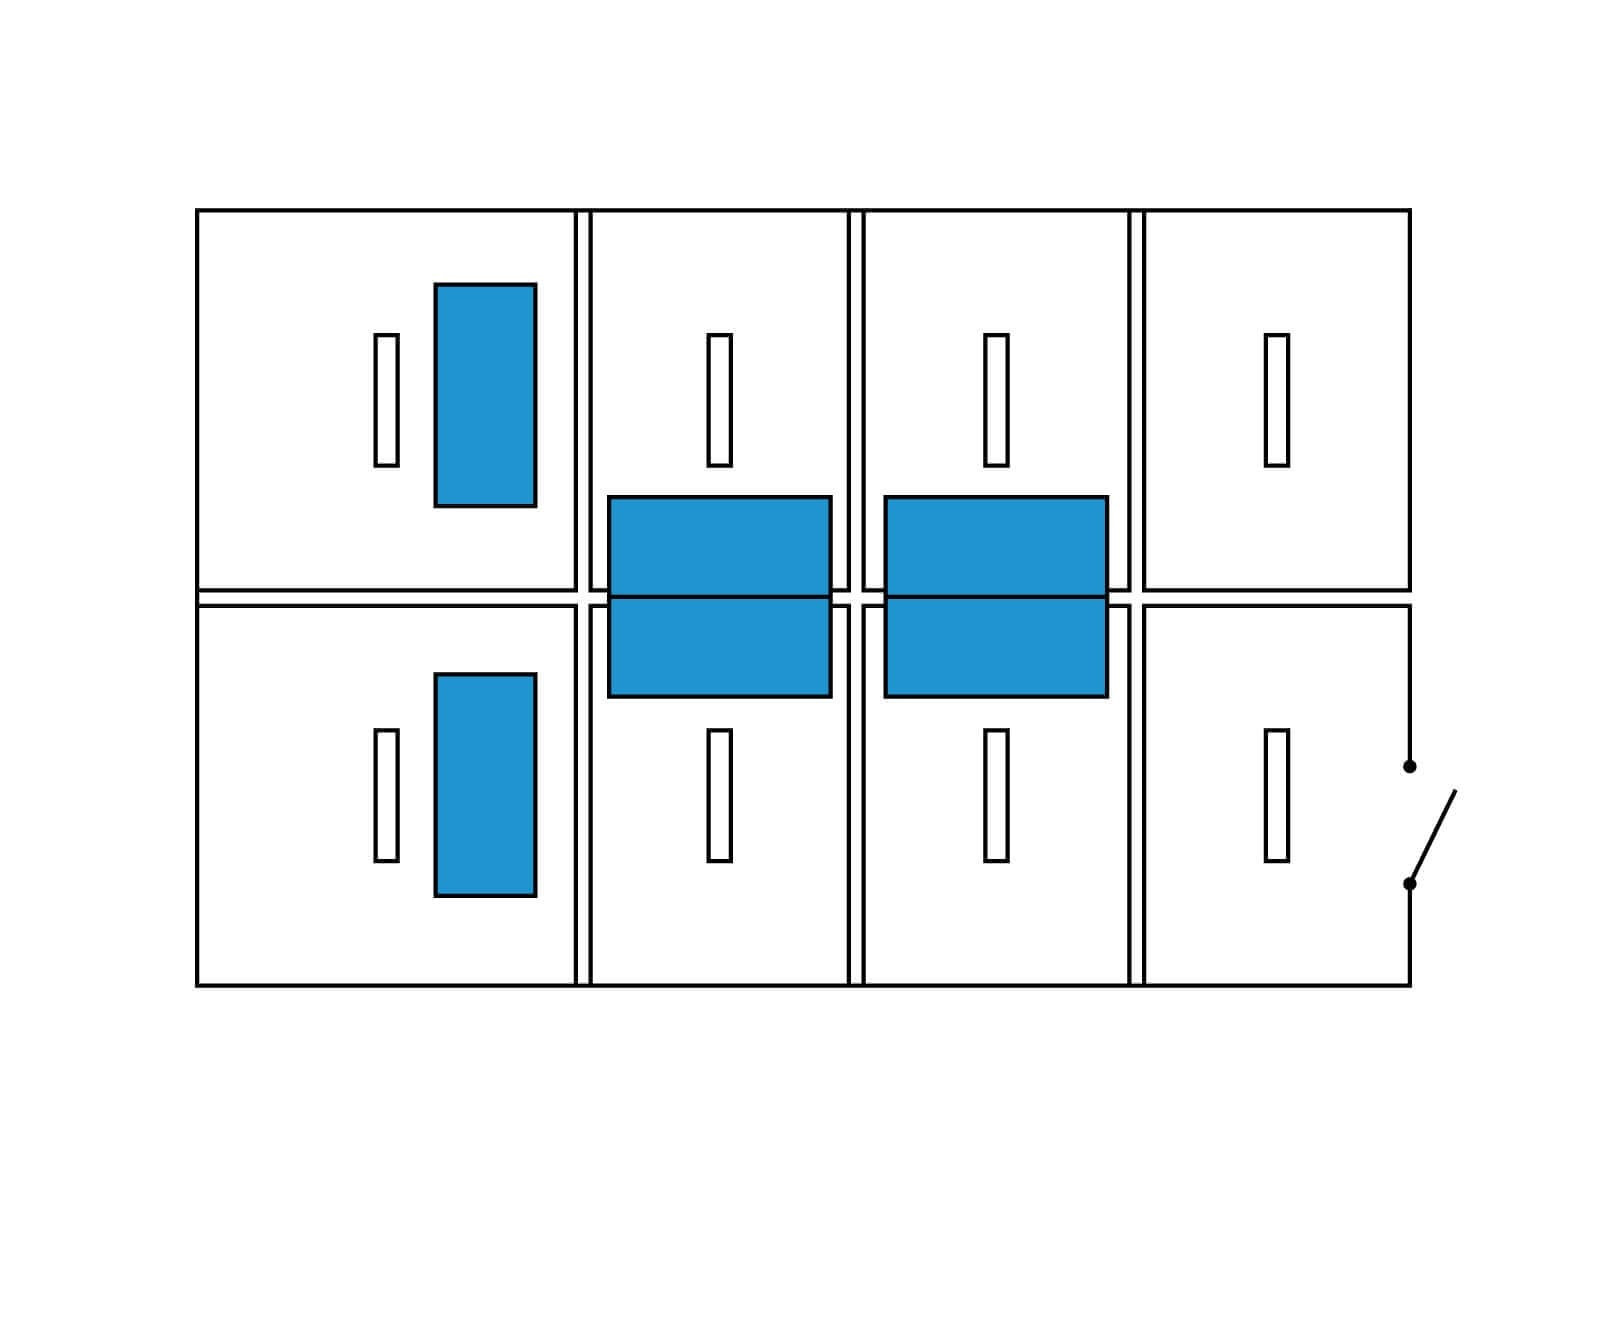 Implantation isolant amovible entre bureaux